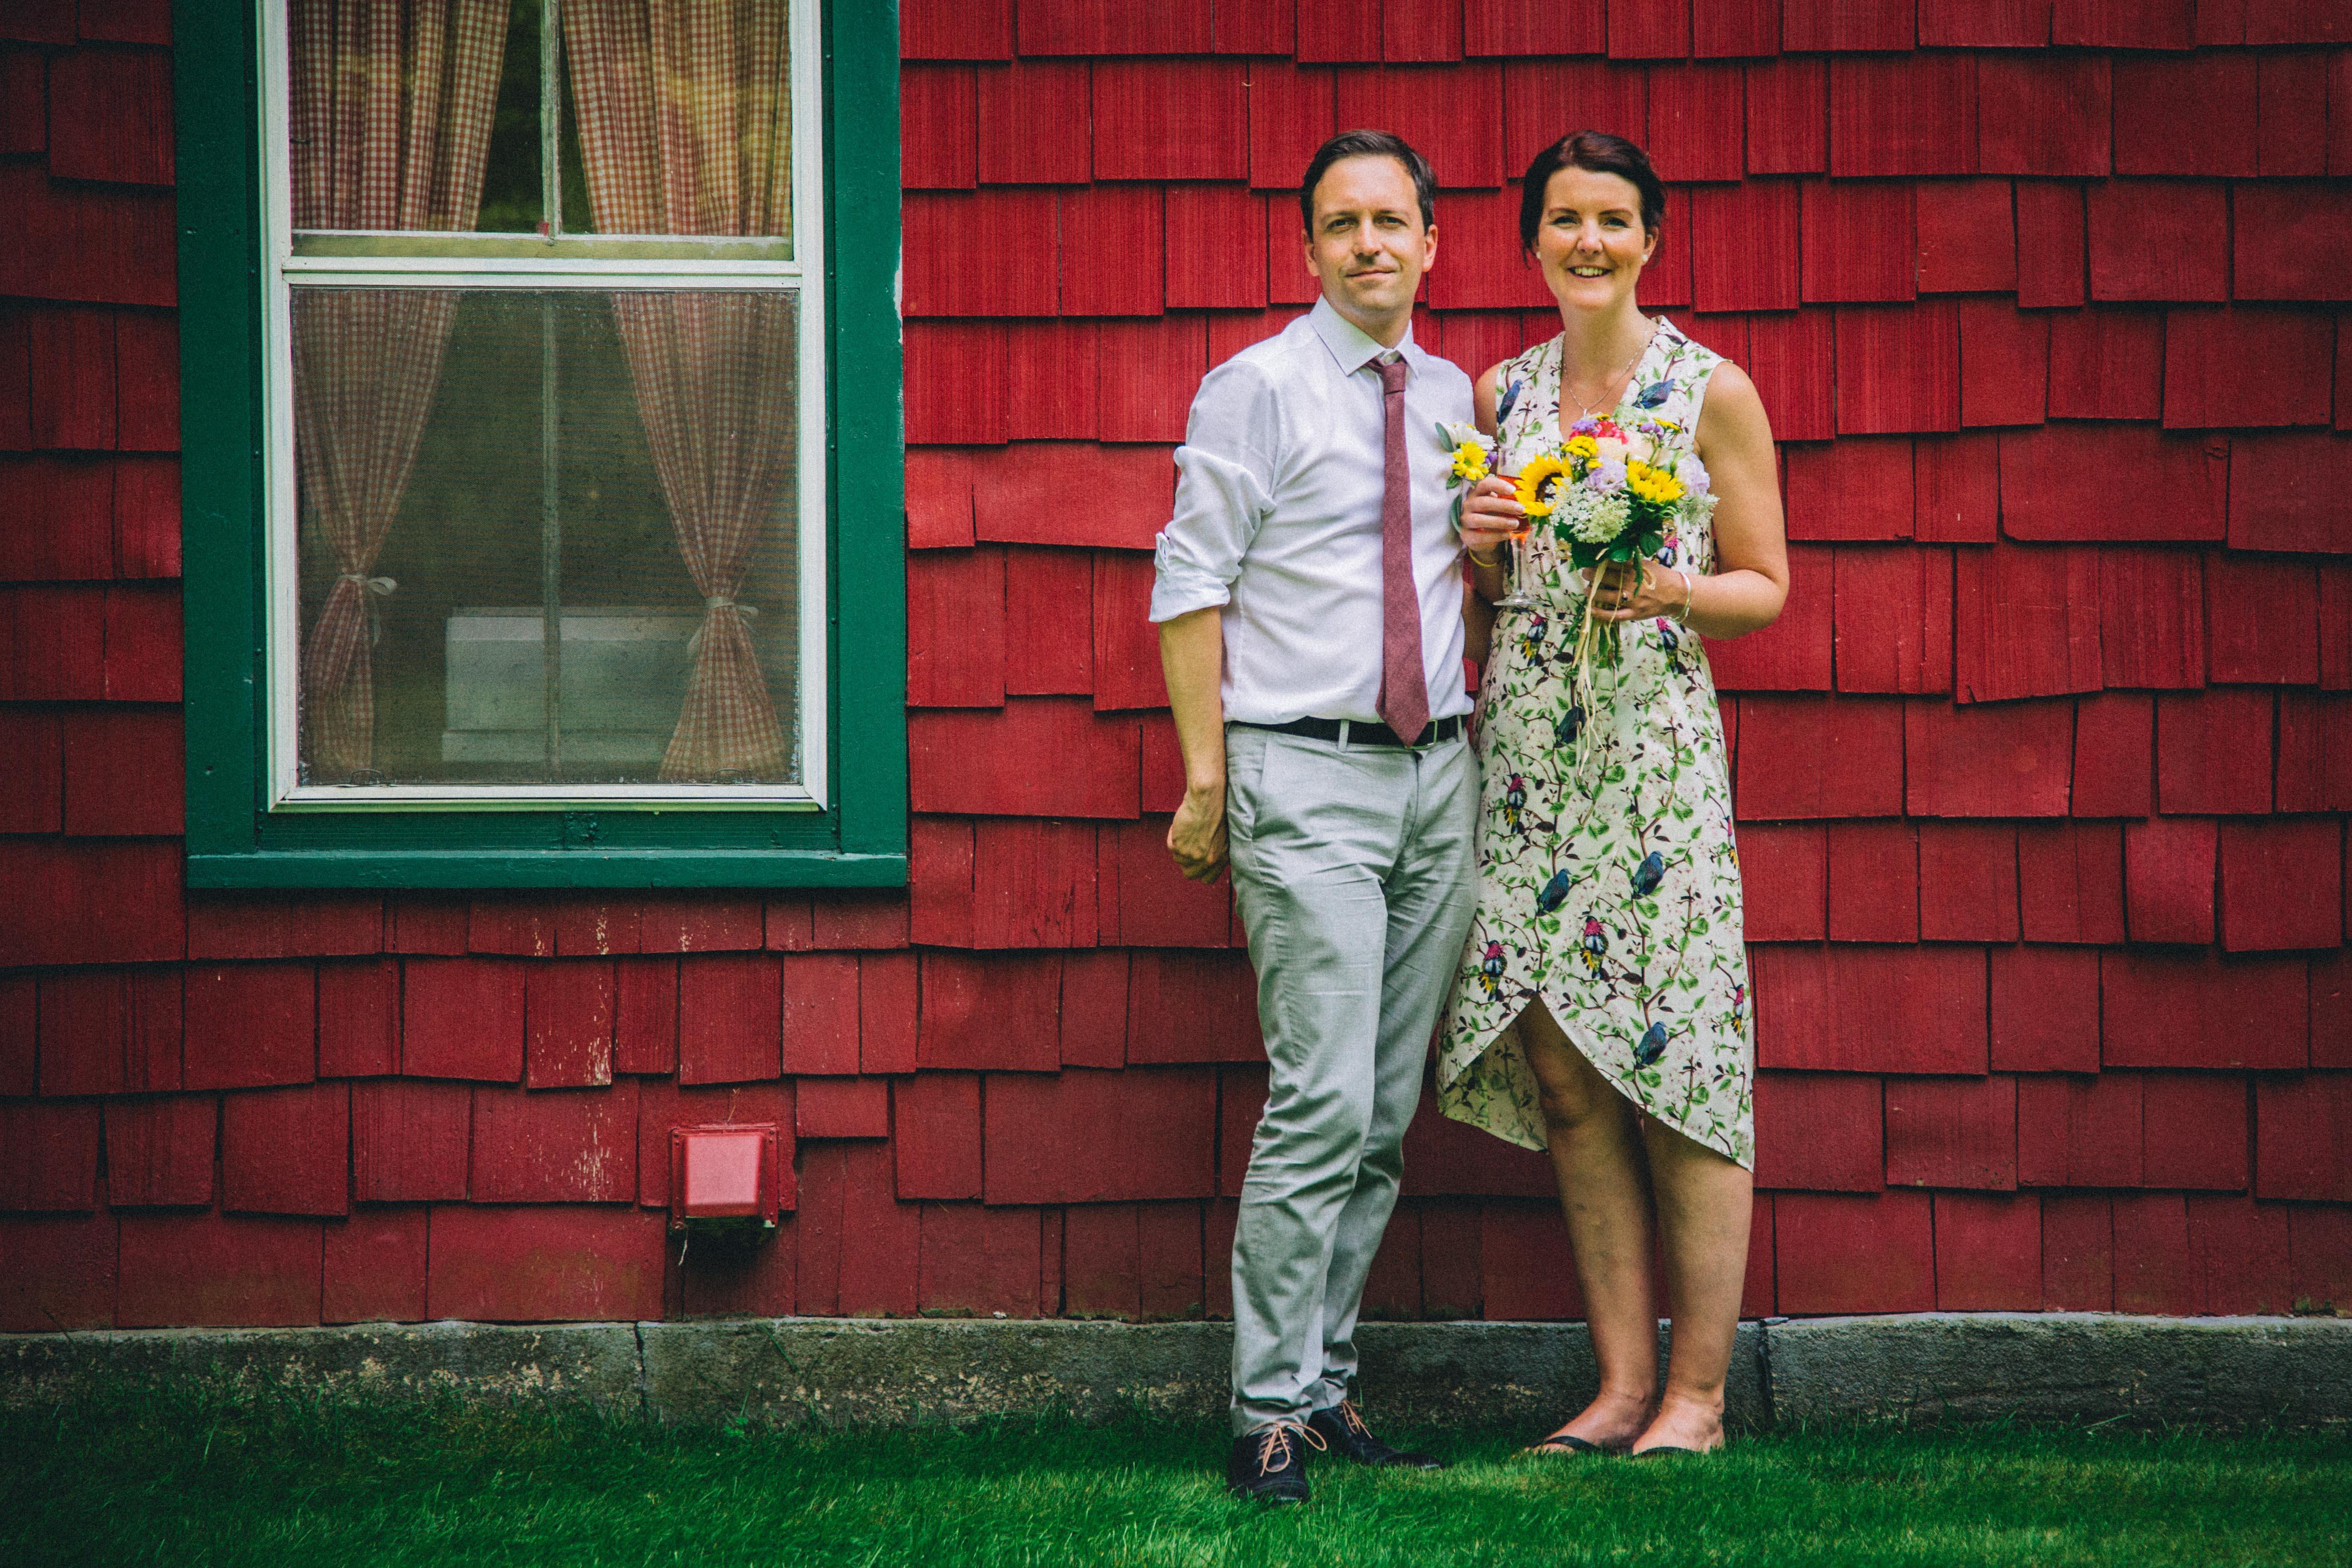 Documentary Wedding Photographer Tyringham, MA